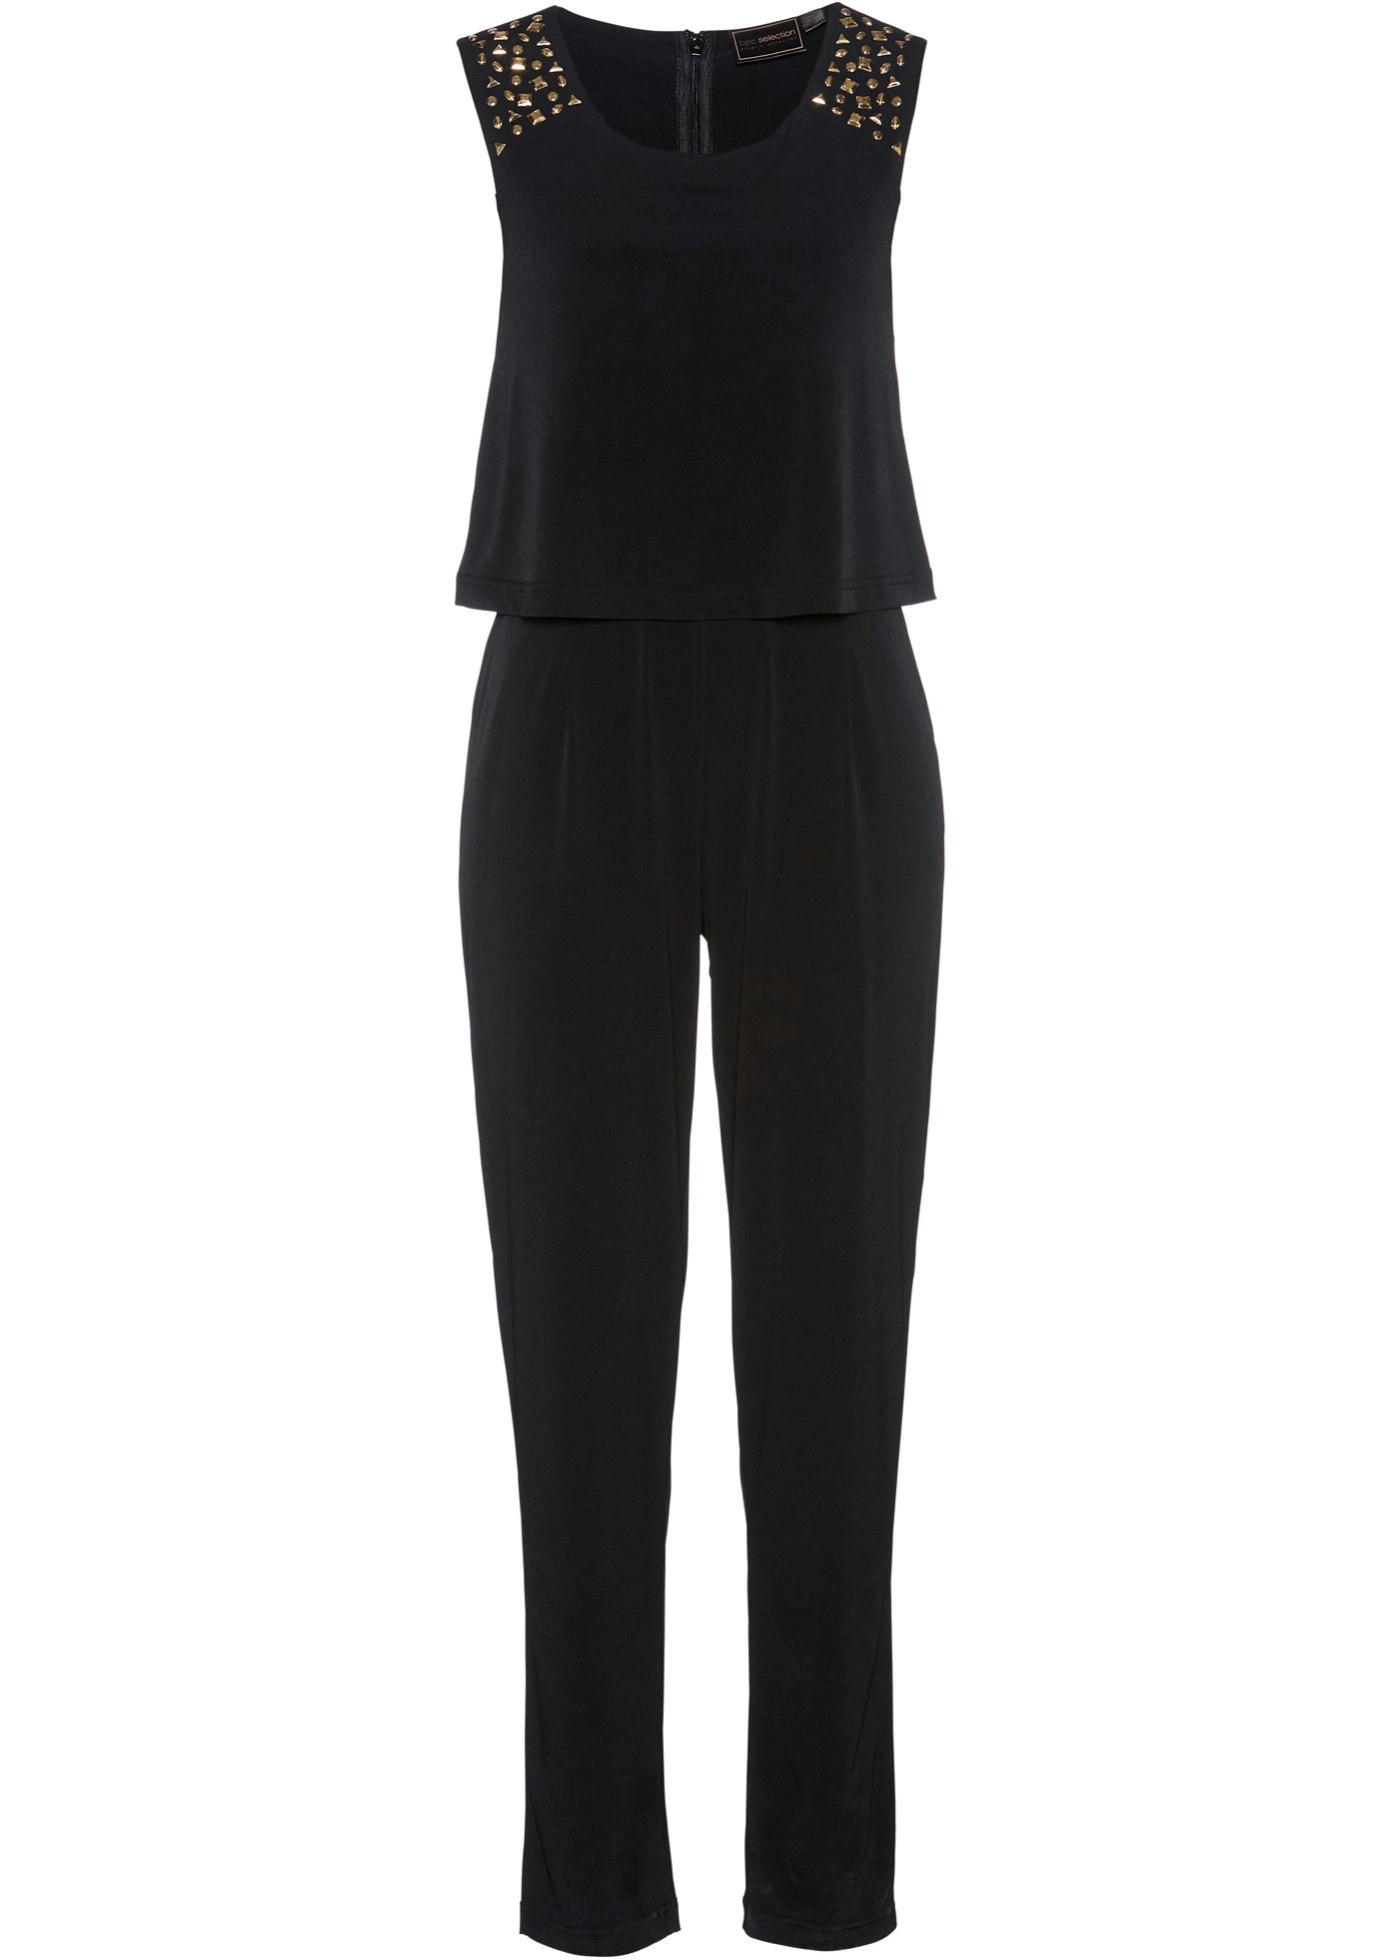 Bpc Manches Noir BonprixCombi Pantalon Femme Selection Sans Pour XukPZi